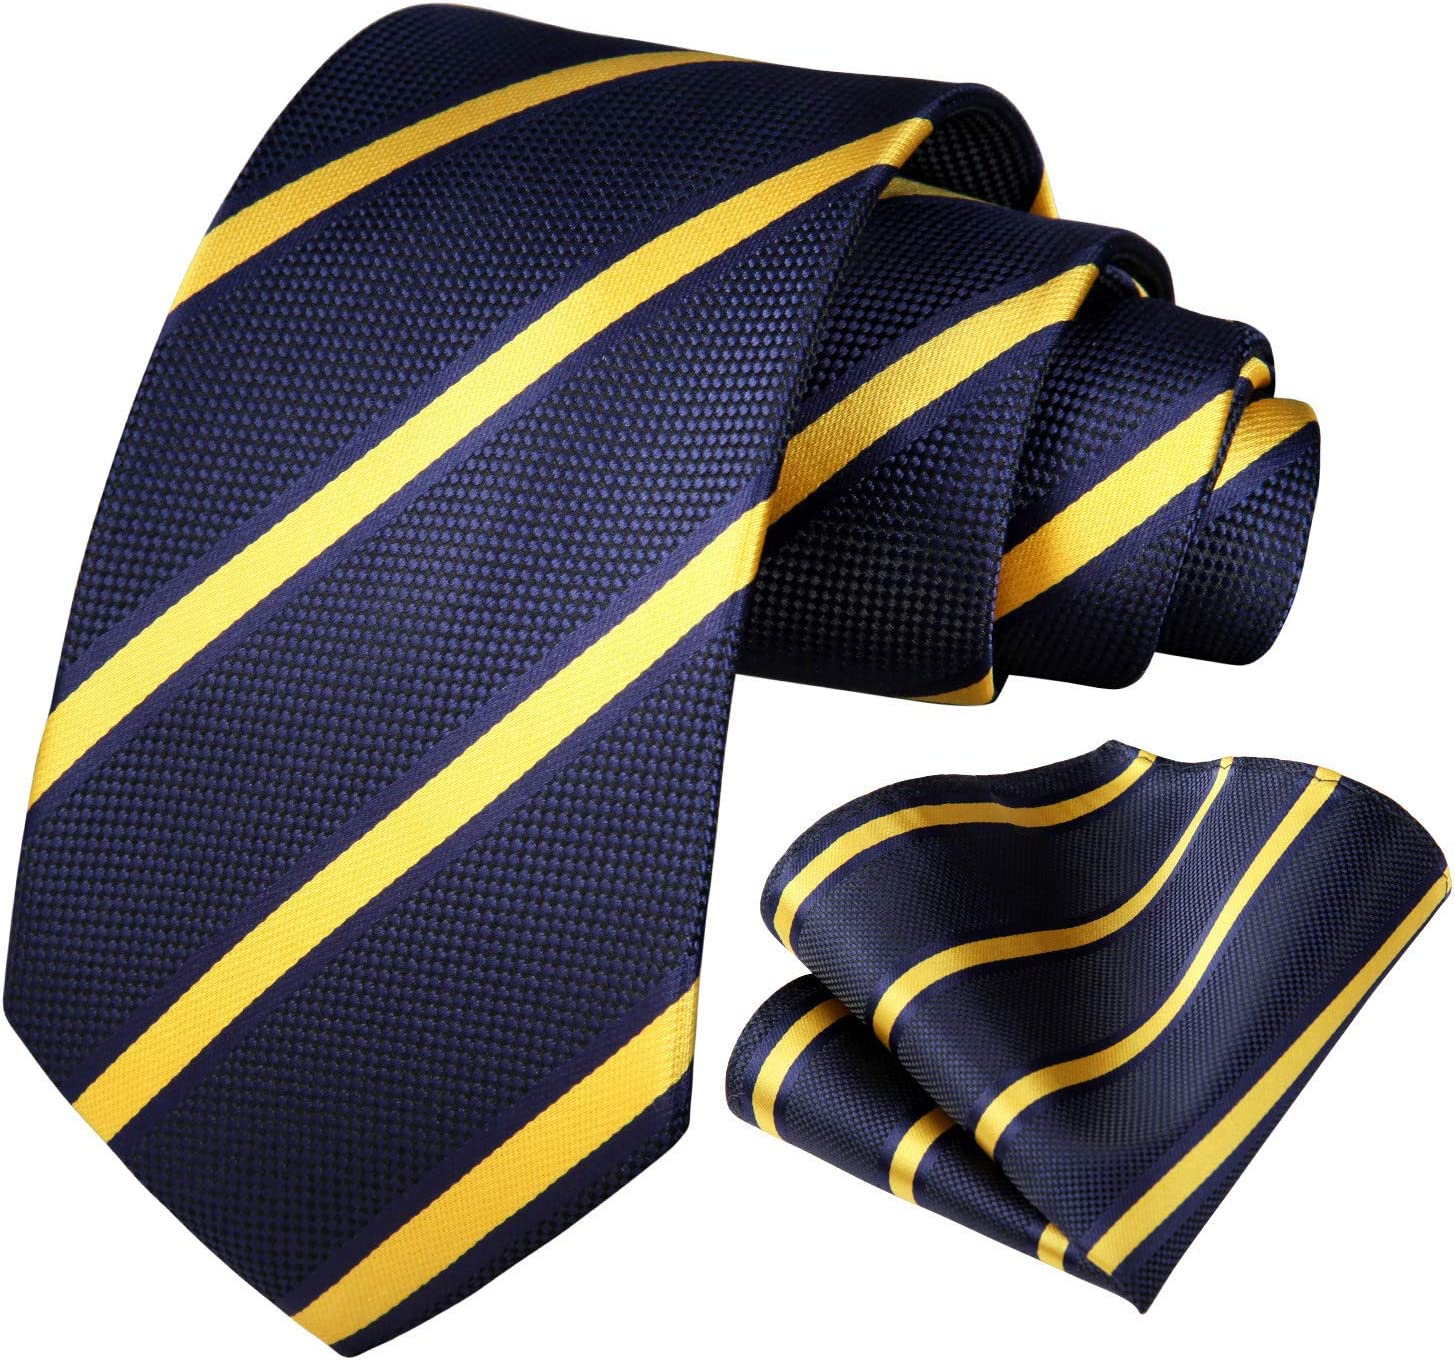 HISDERN Striped Tie for Men Handkerchief Woven Classic Collegiate Mens Necktie /& Pocket Square Set Orange